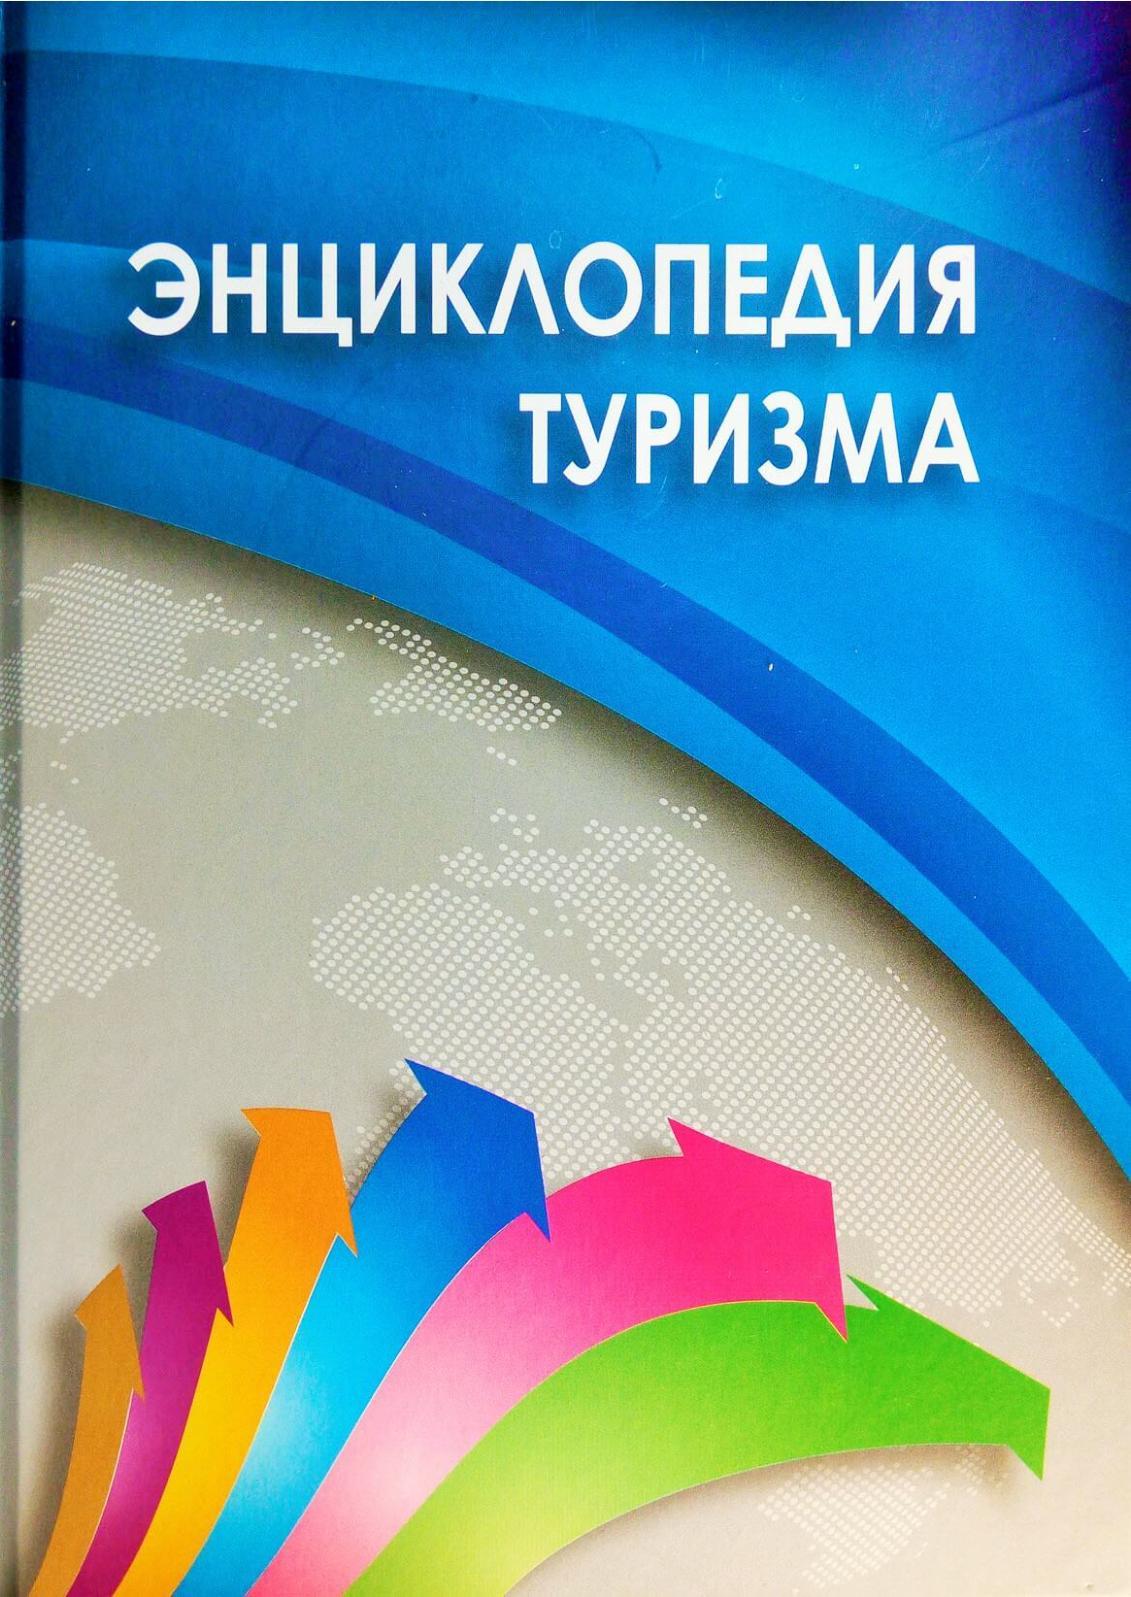 Calaméo - Энциклопедия туризма 8a0319aa6f522